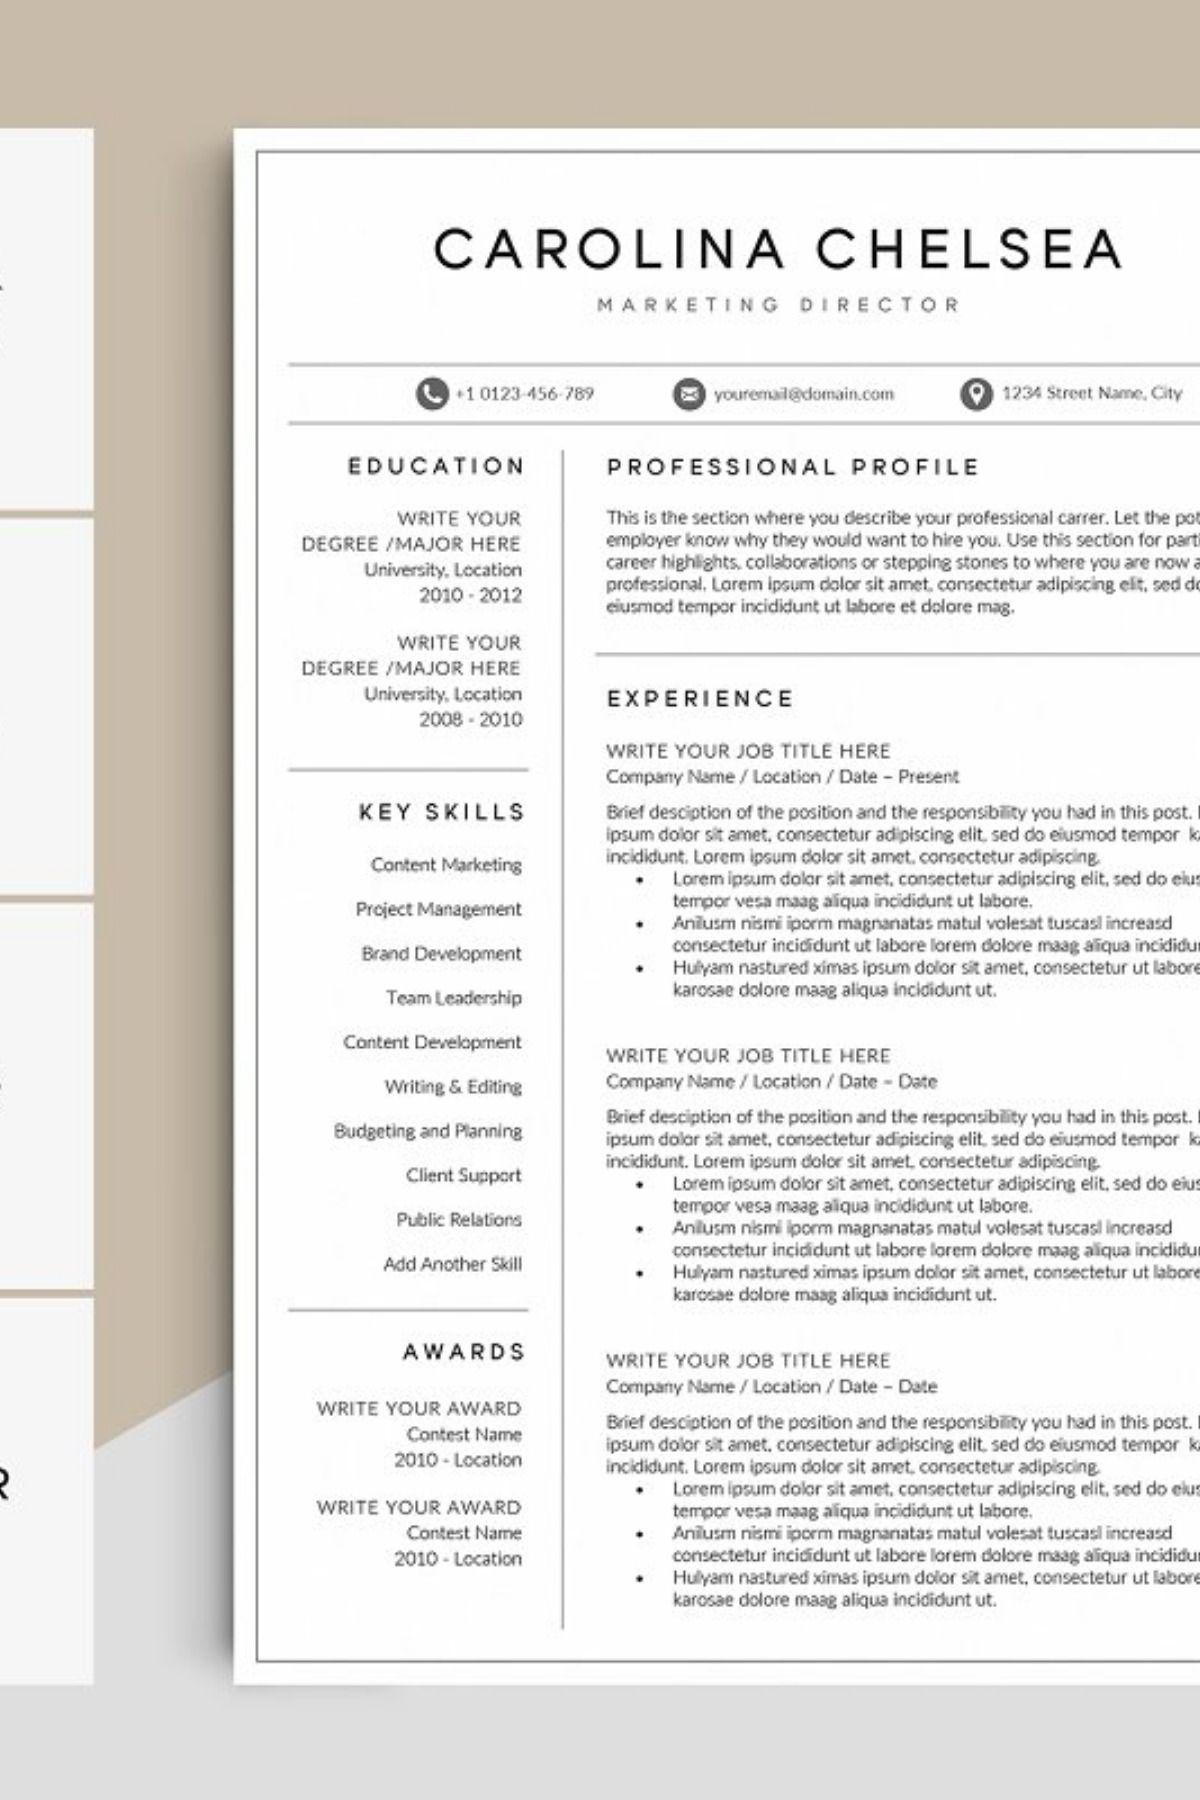 Resume/CV Template CAROLINA Best resume template